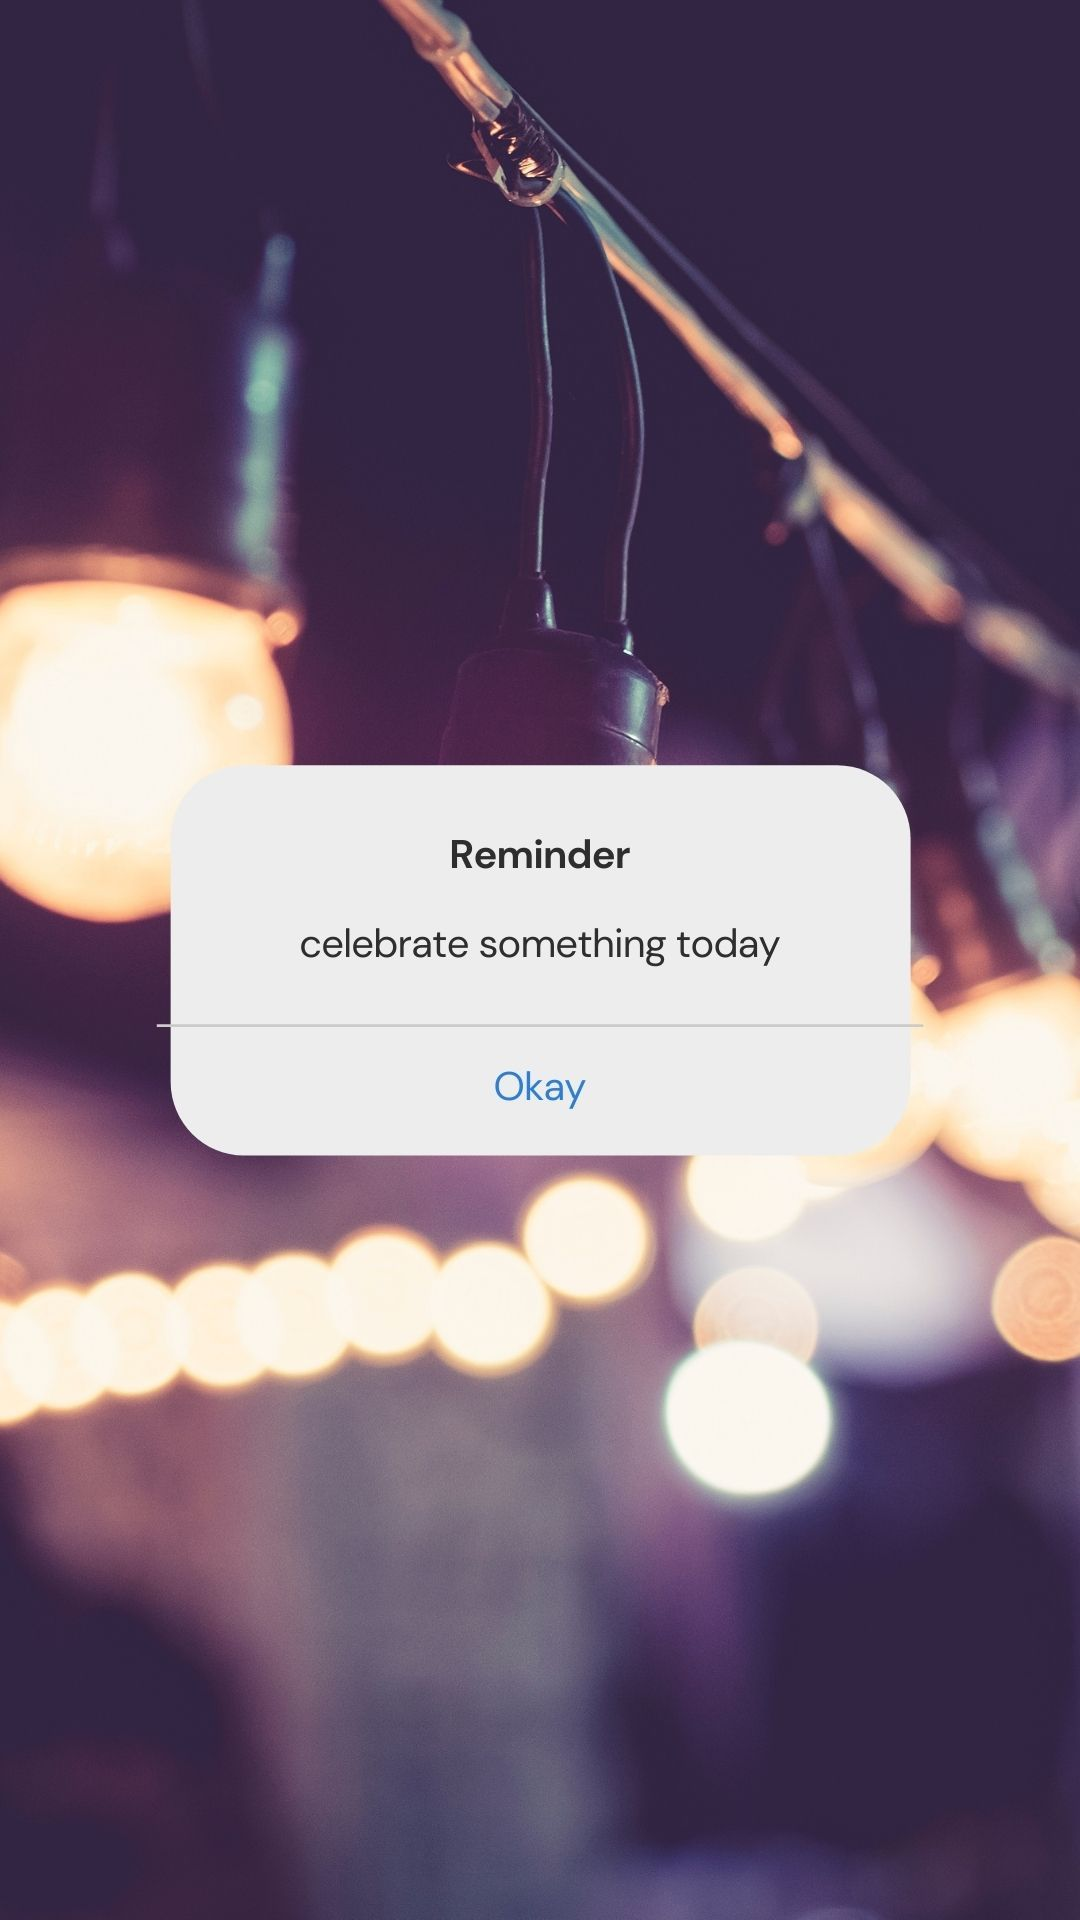 Reminder: Celebrate everyday